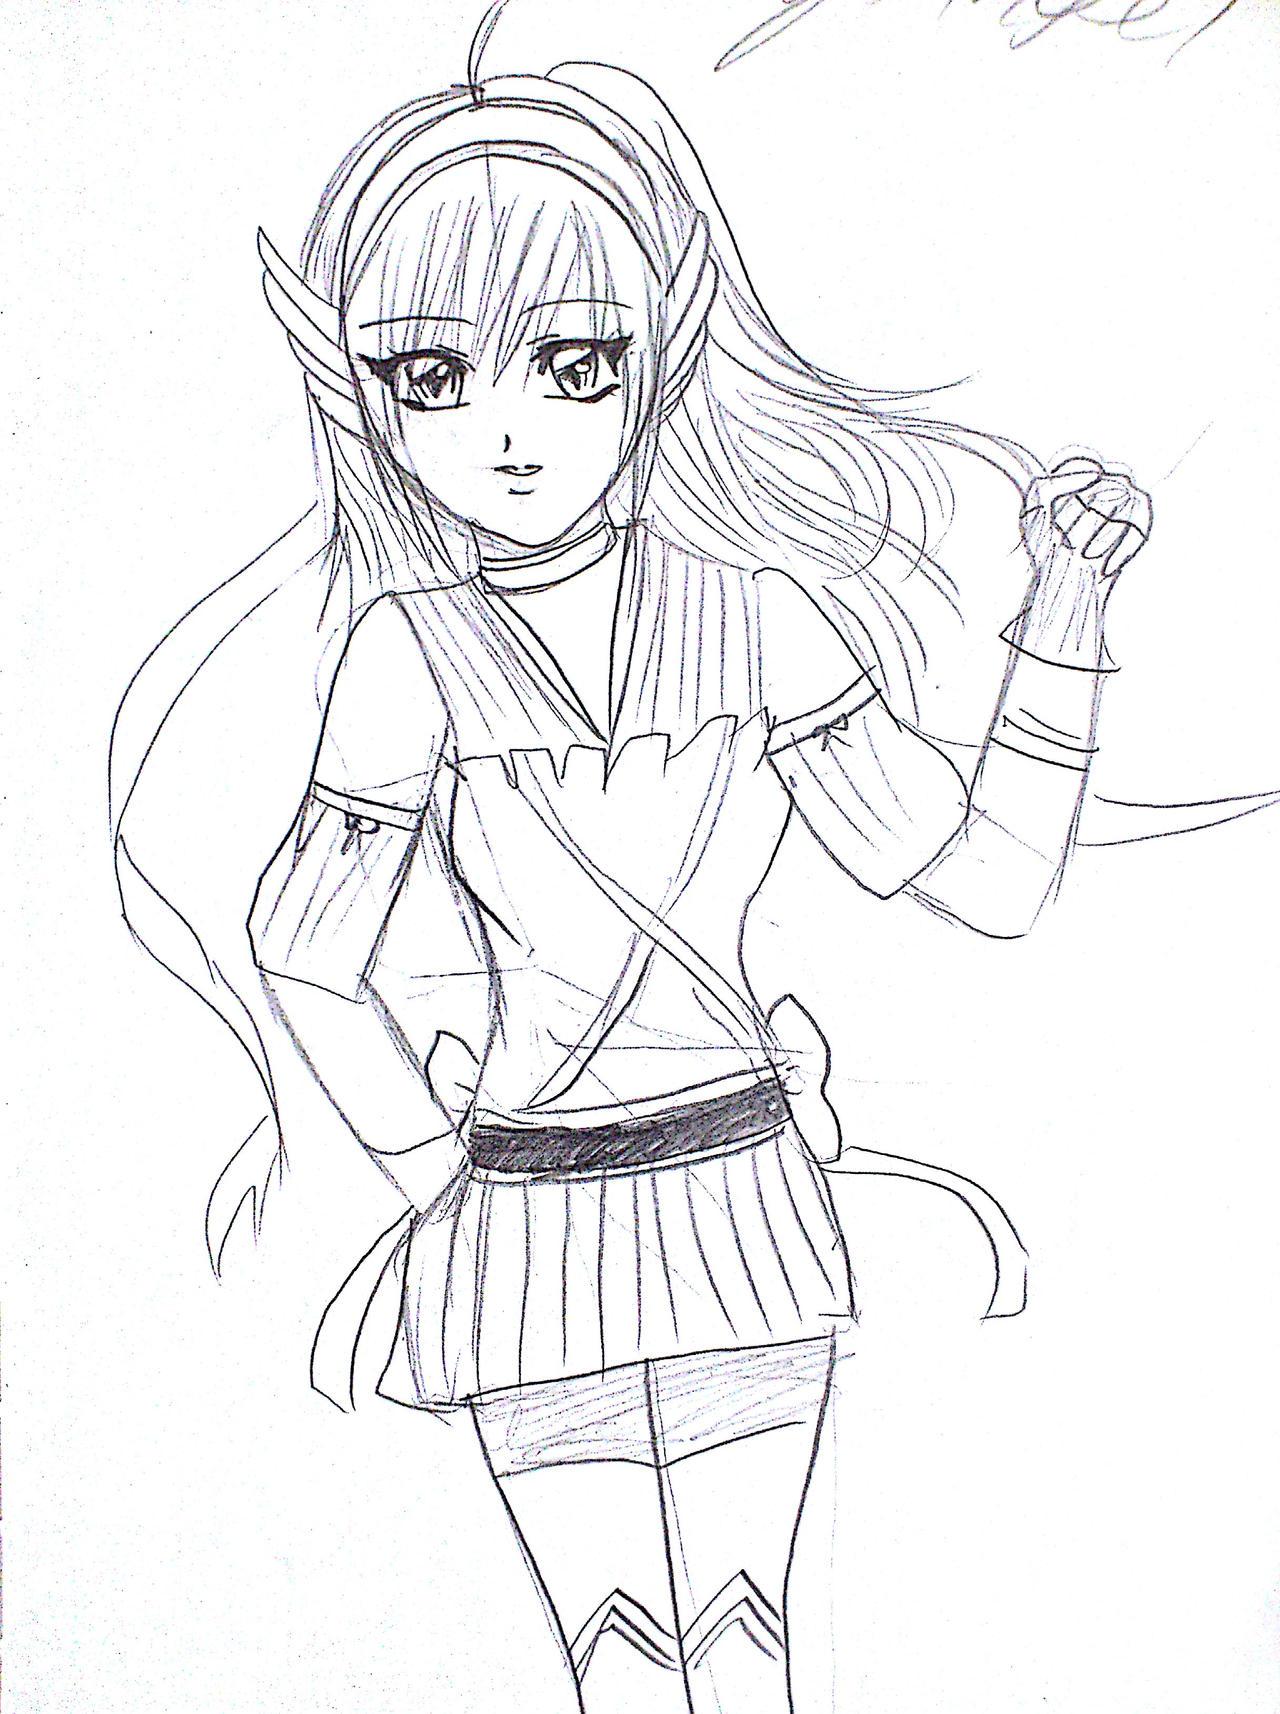 Anime Drawings - Anime Drawings By Irihime 3Chan Beig